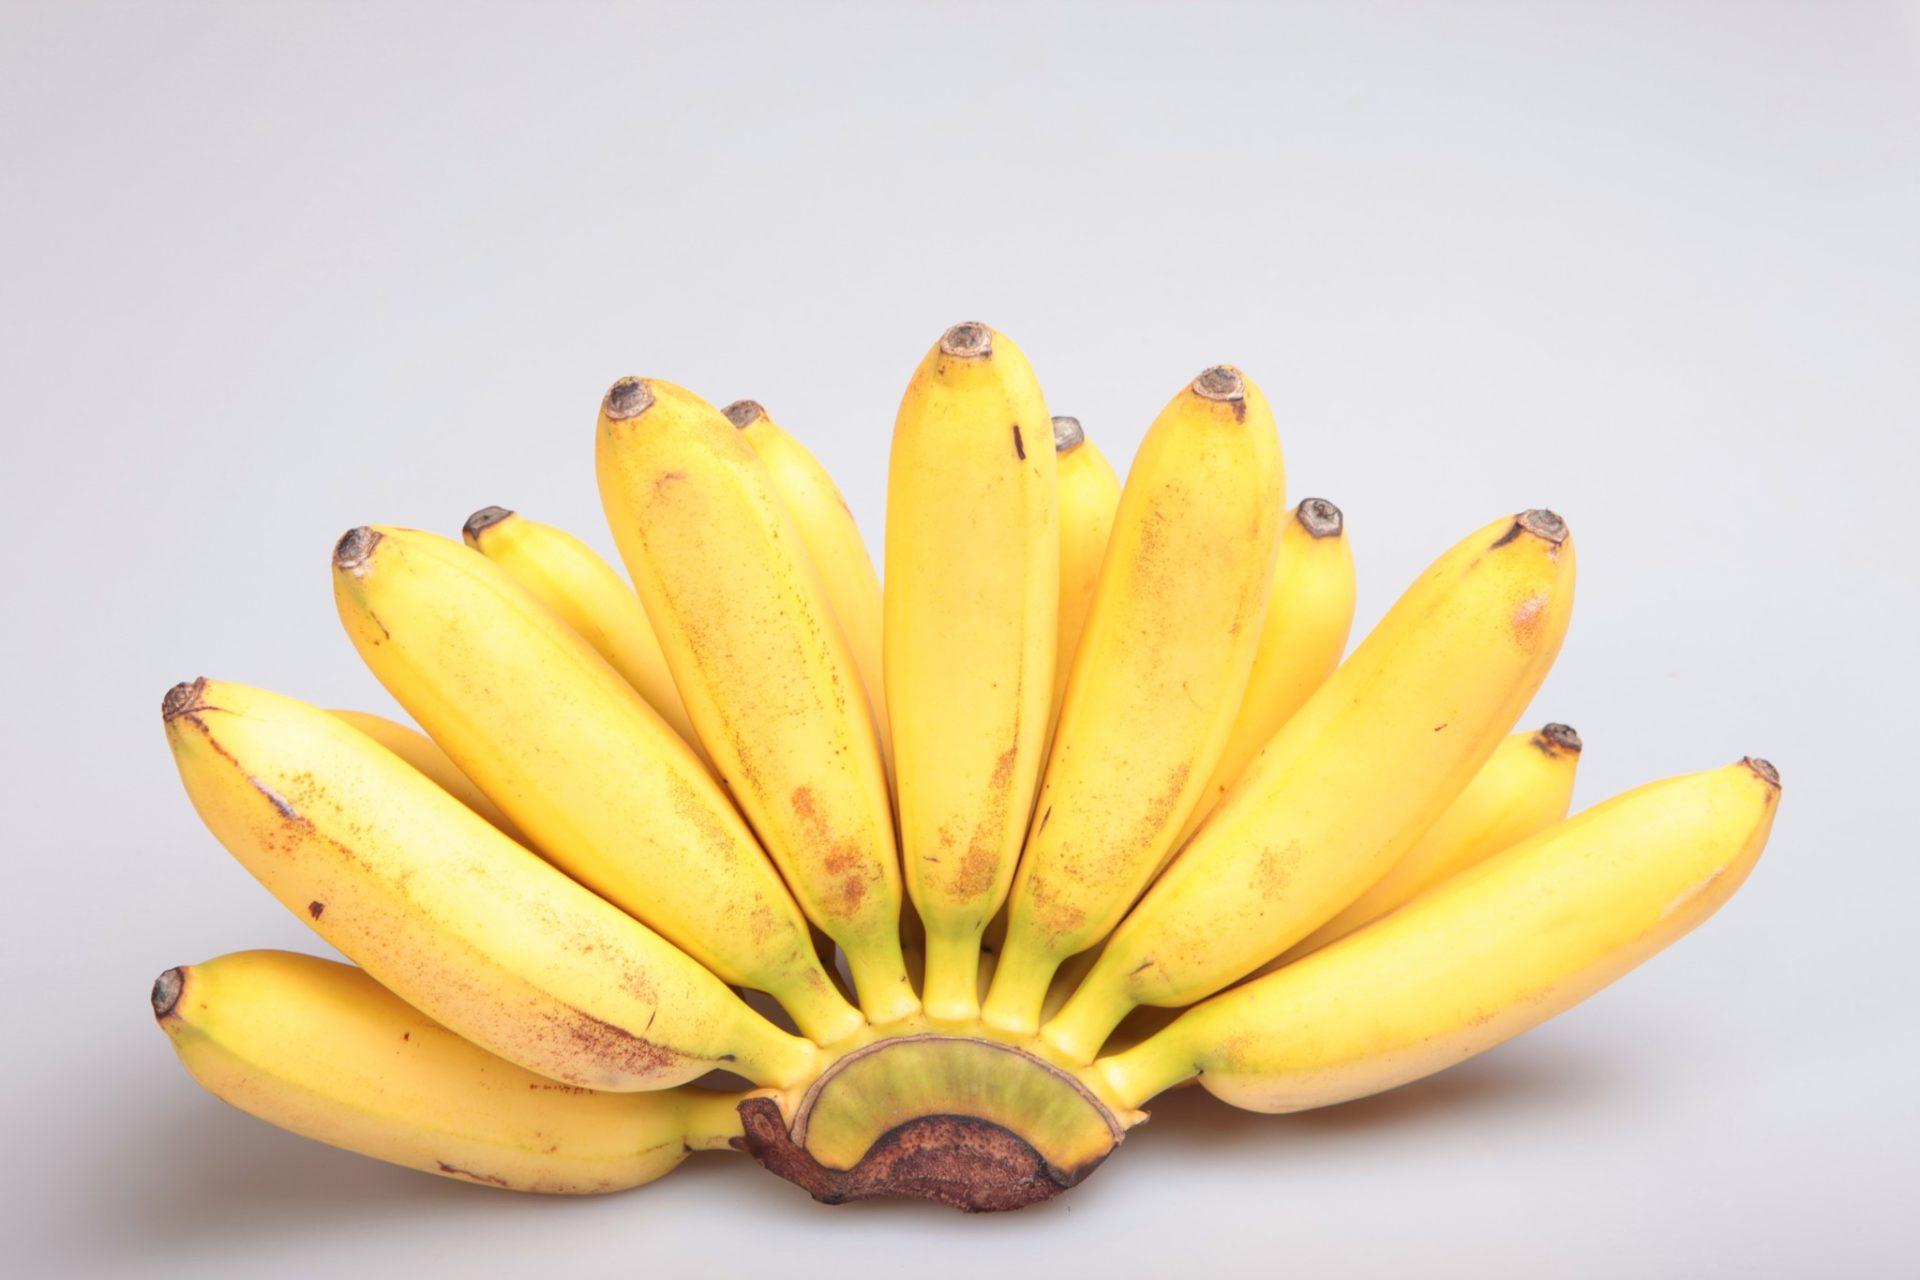 stockvault-bananas130078